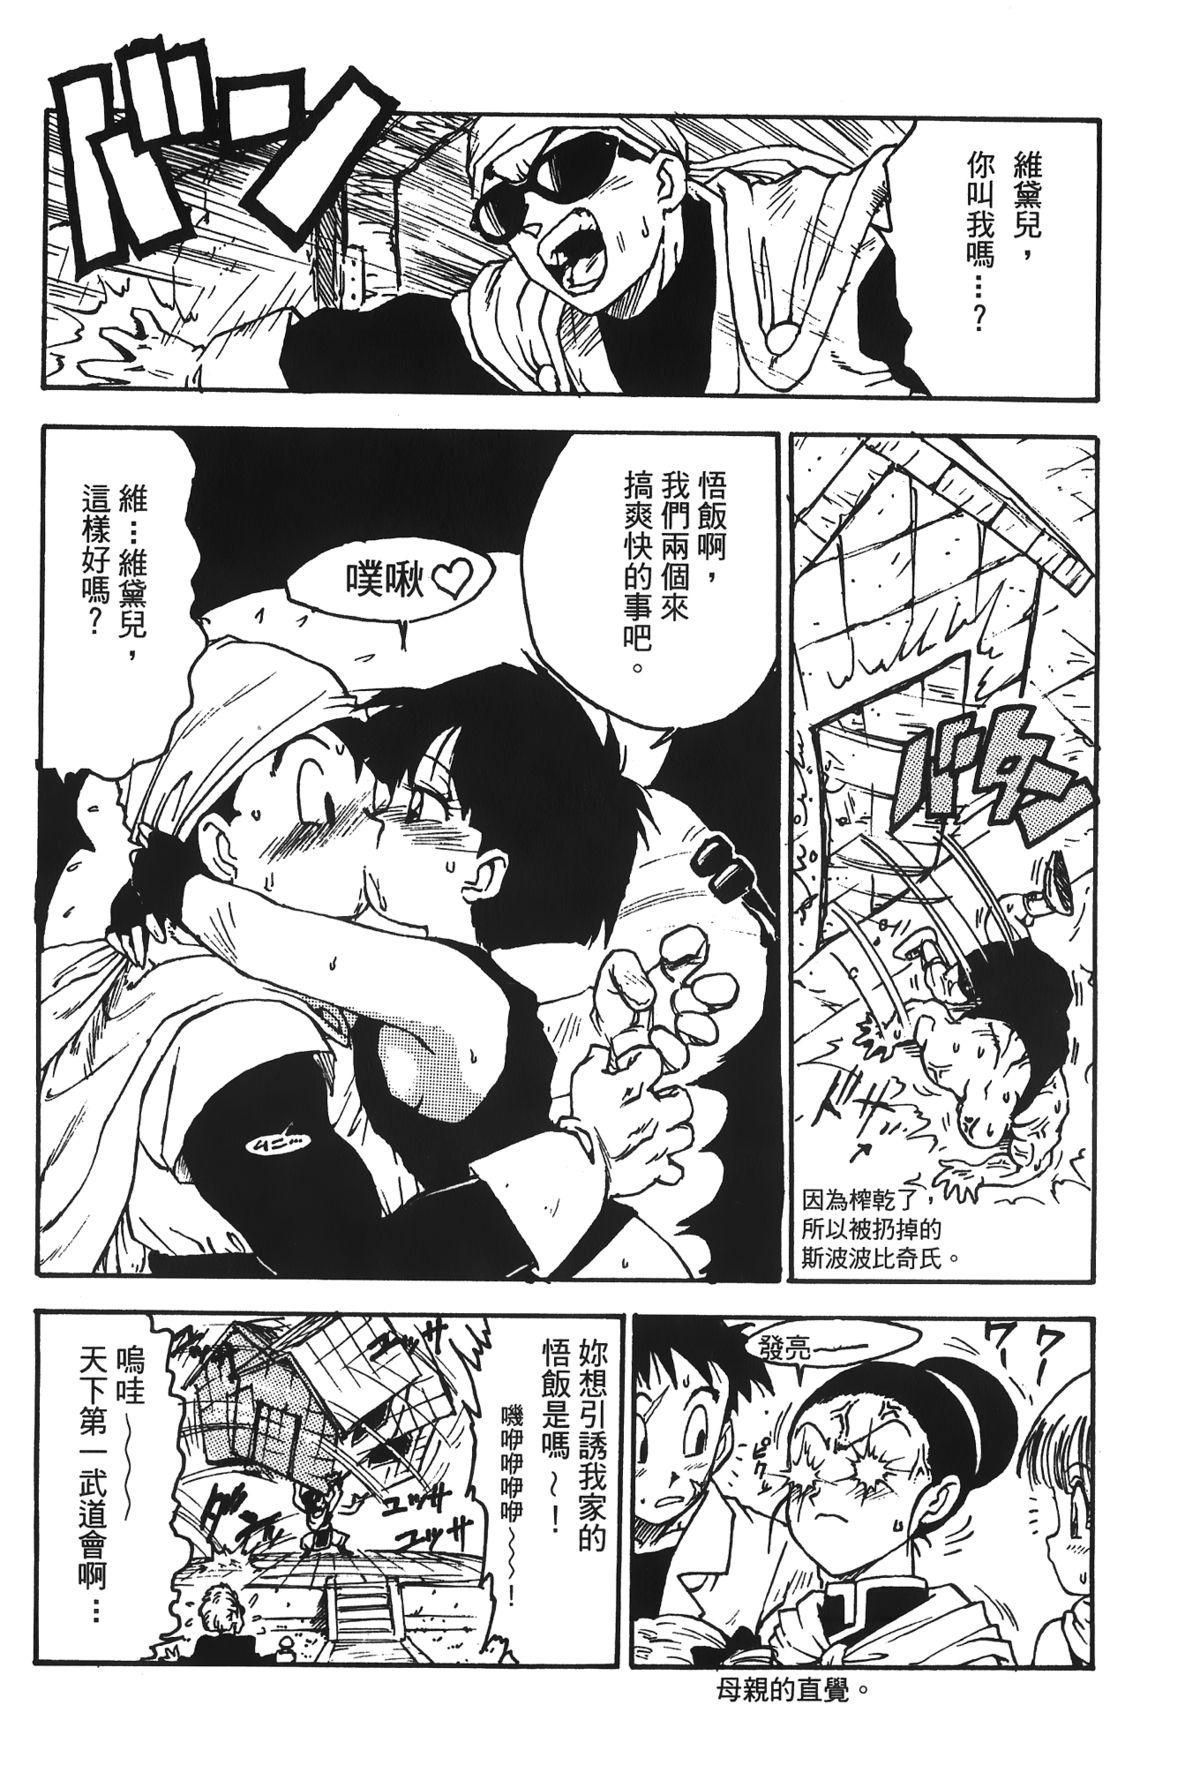 Dragon Pearl 05 56